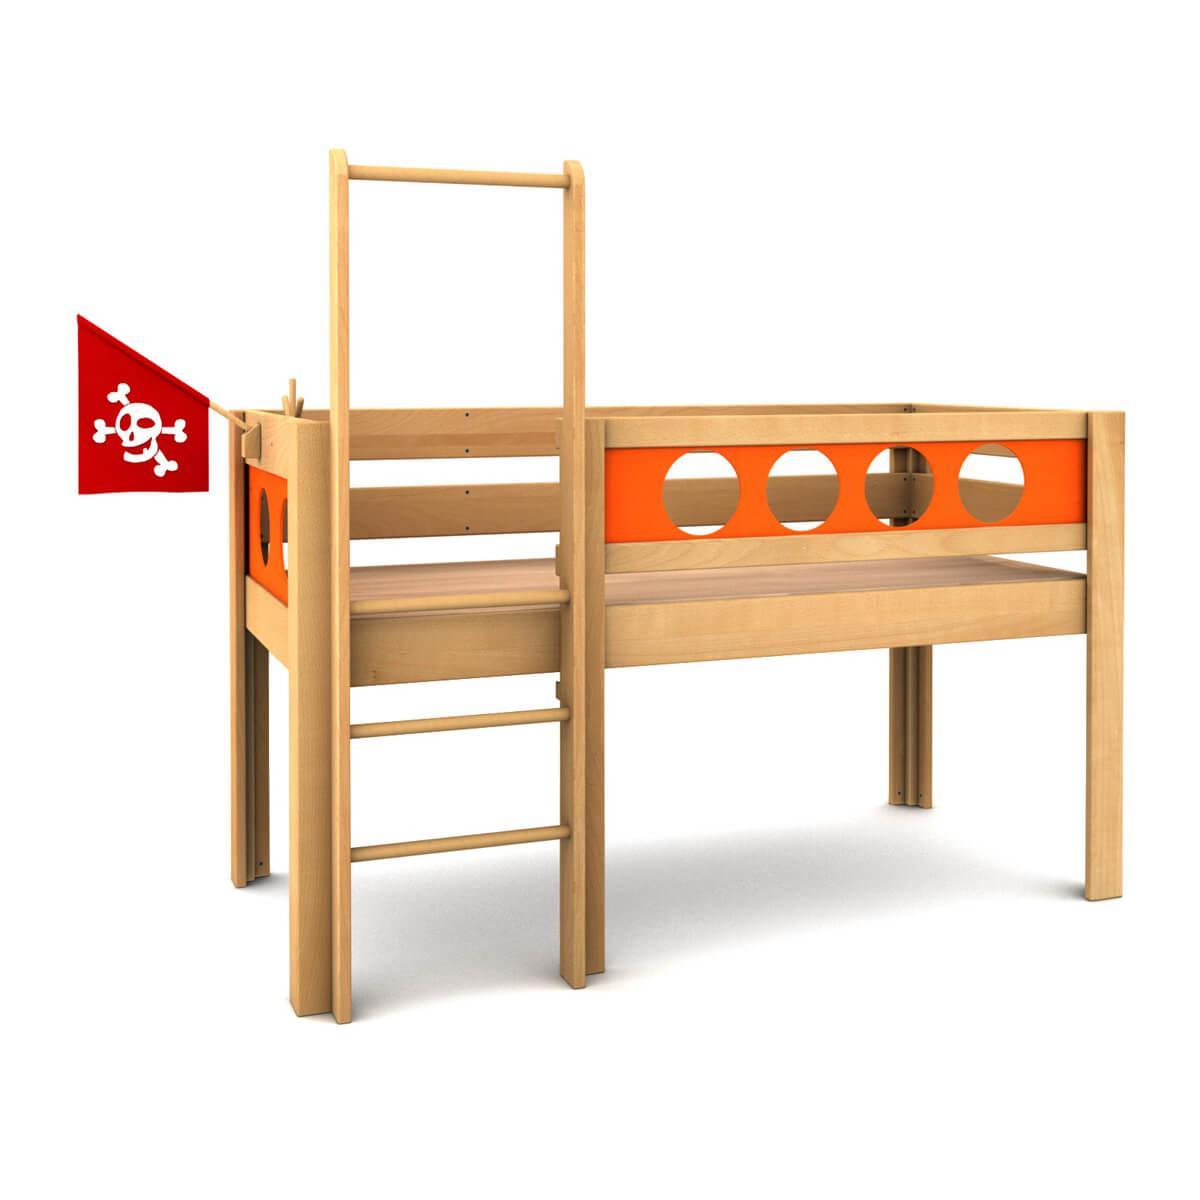 Pirat halbhohes Bett DELUXE de Breuyn geölt-Füllungen orange